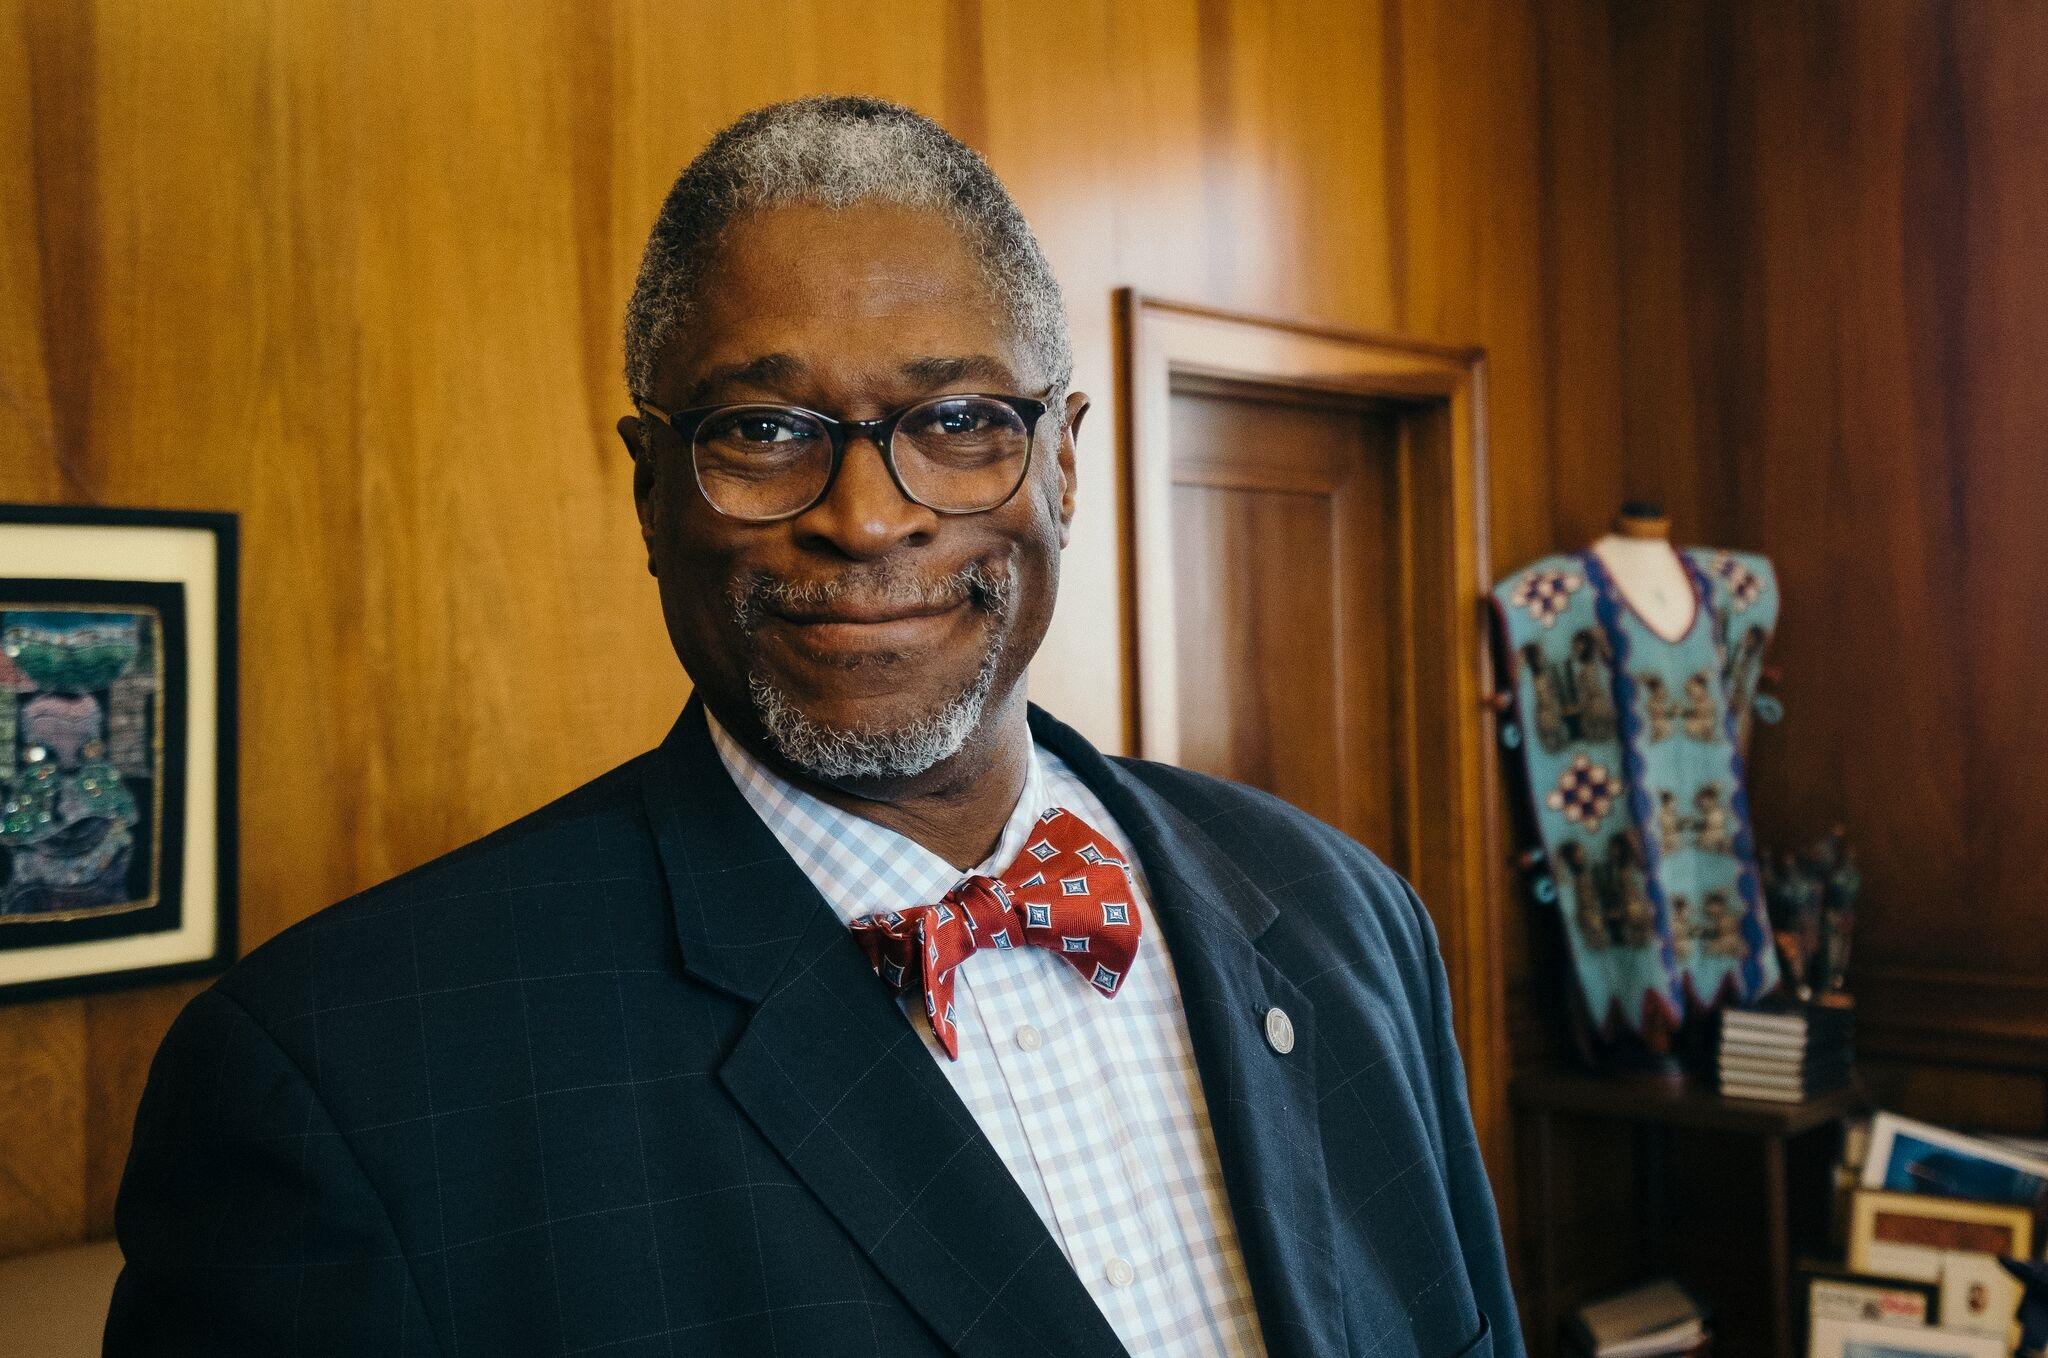 Former Mayor Sly James - Kansas City